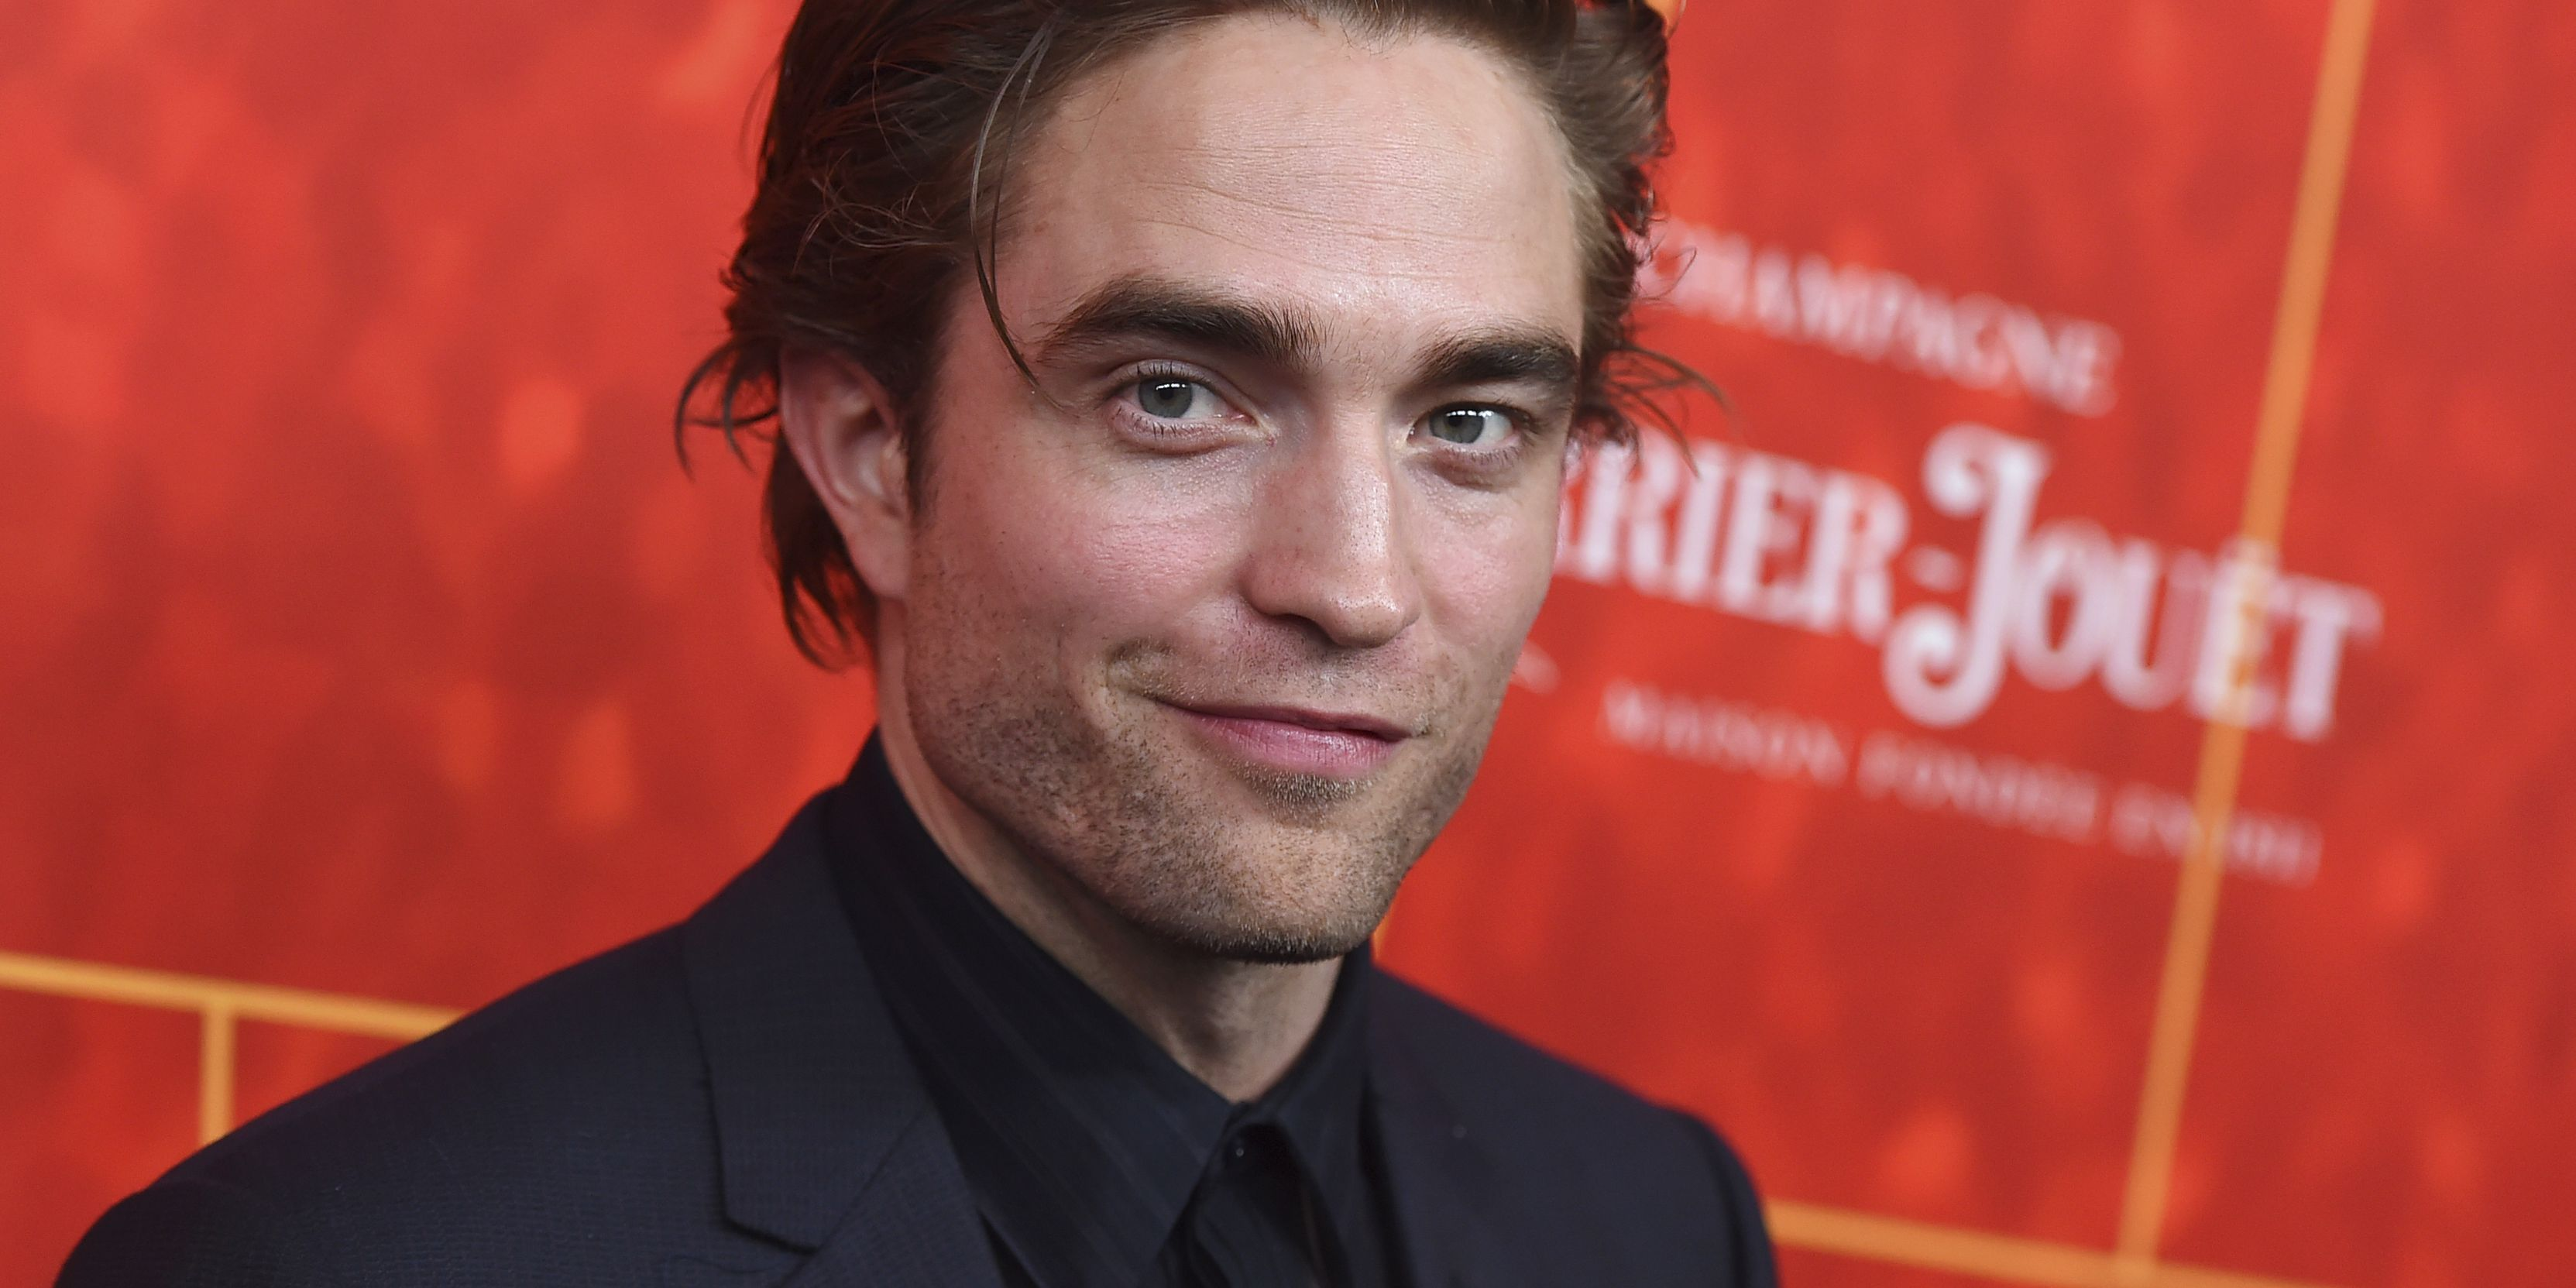 Robert Pattinson will be the next Batman